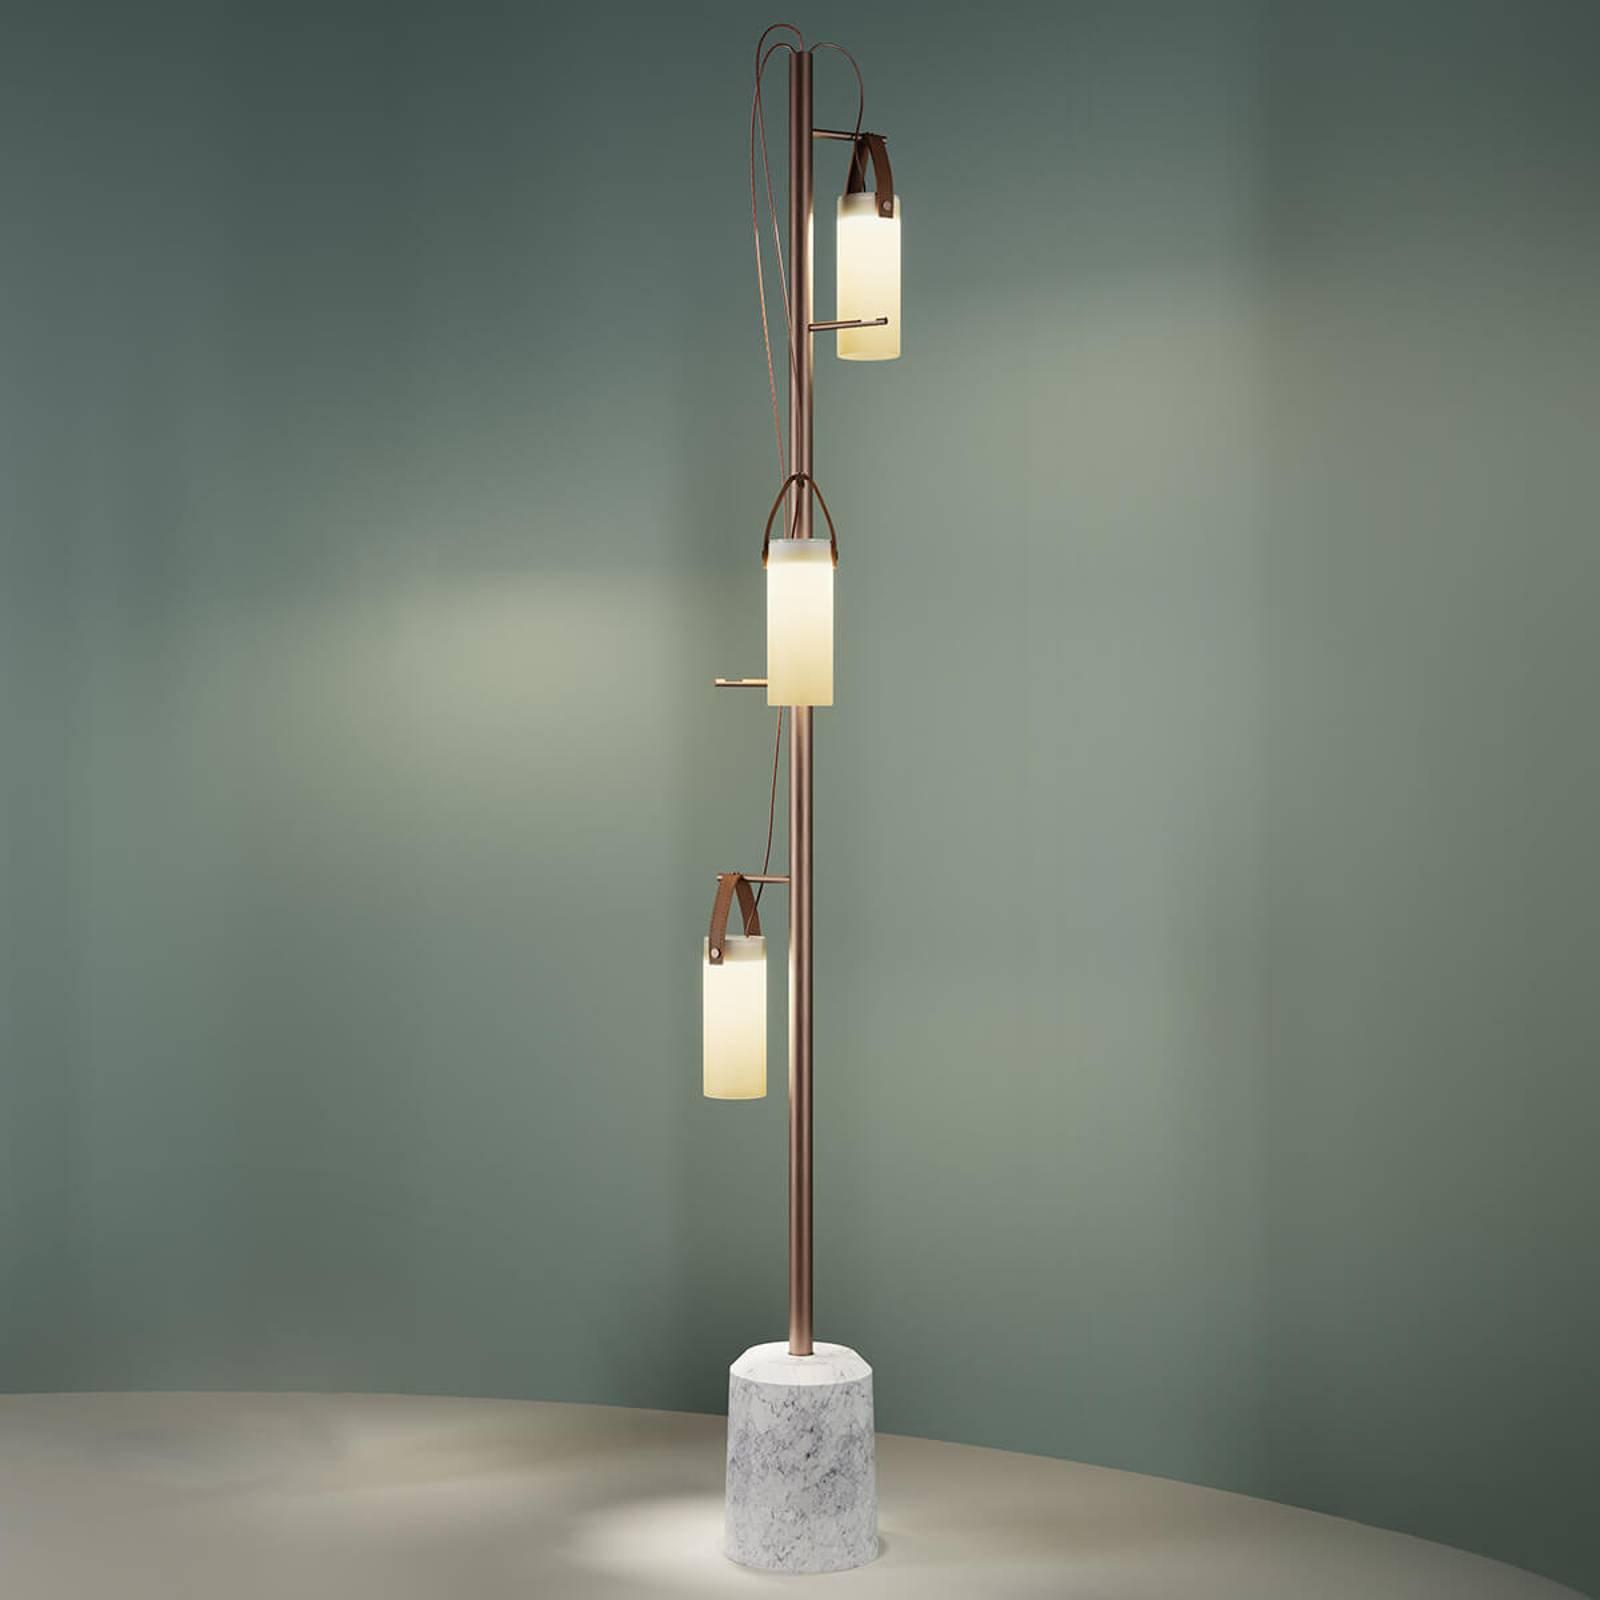 3 lyskilder designer LED gulvlampe Galerie